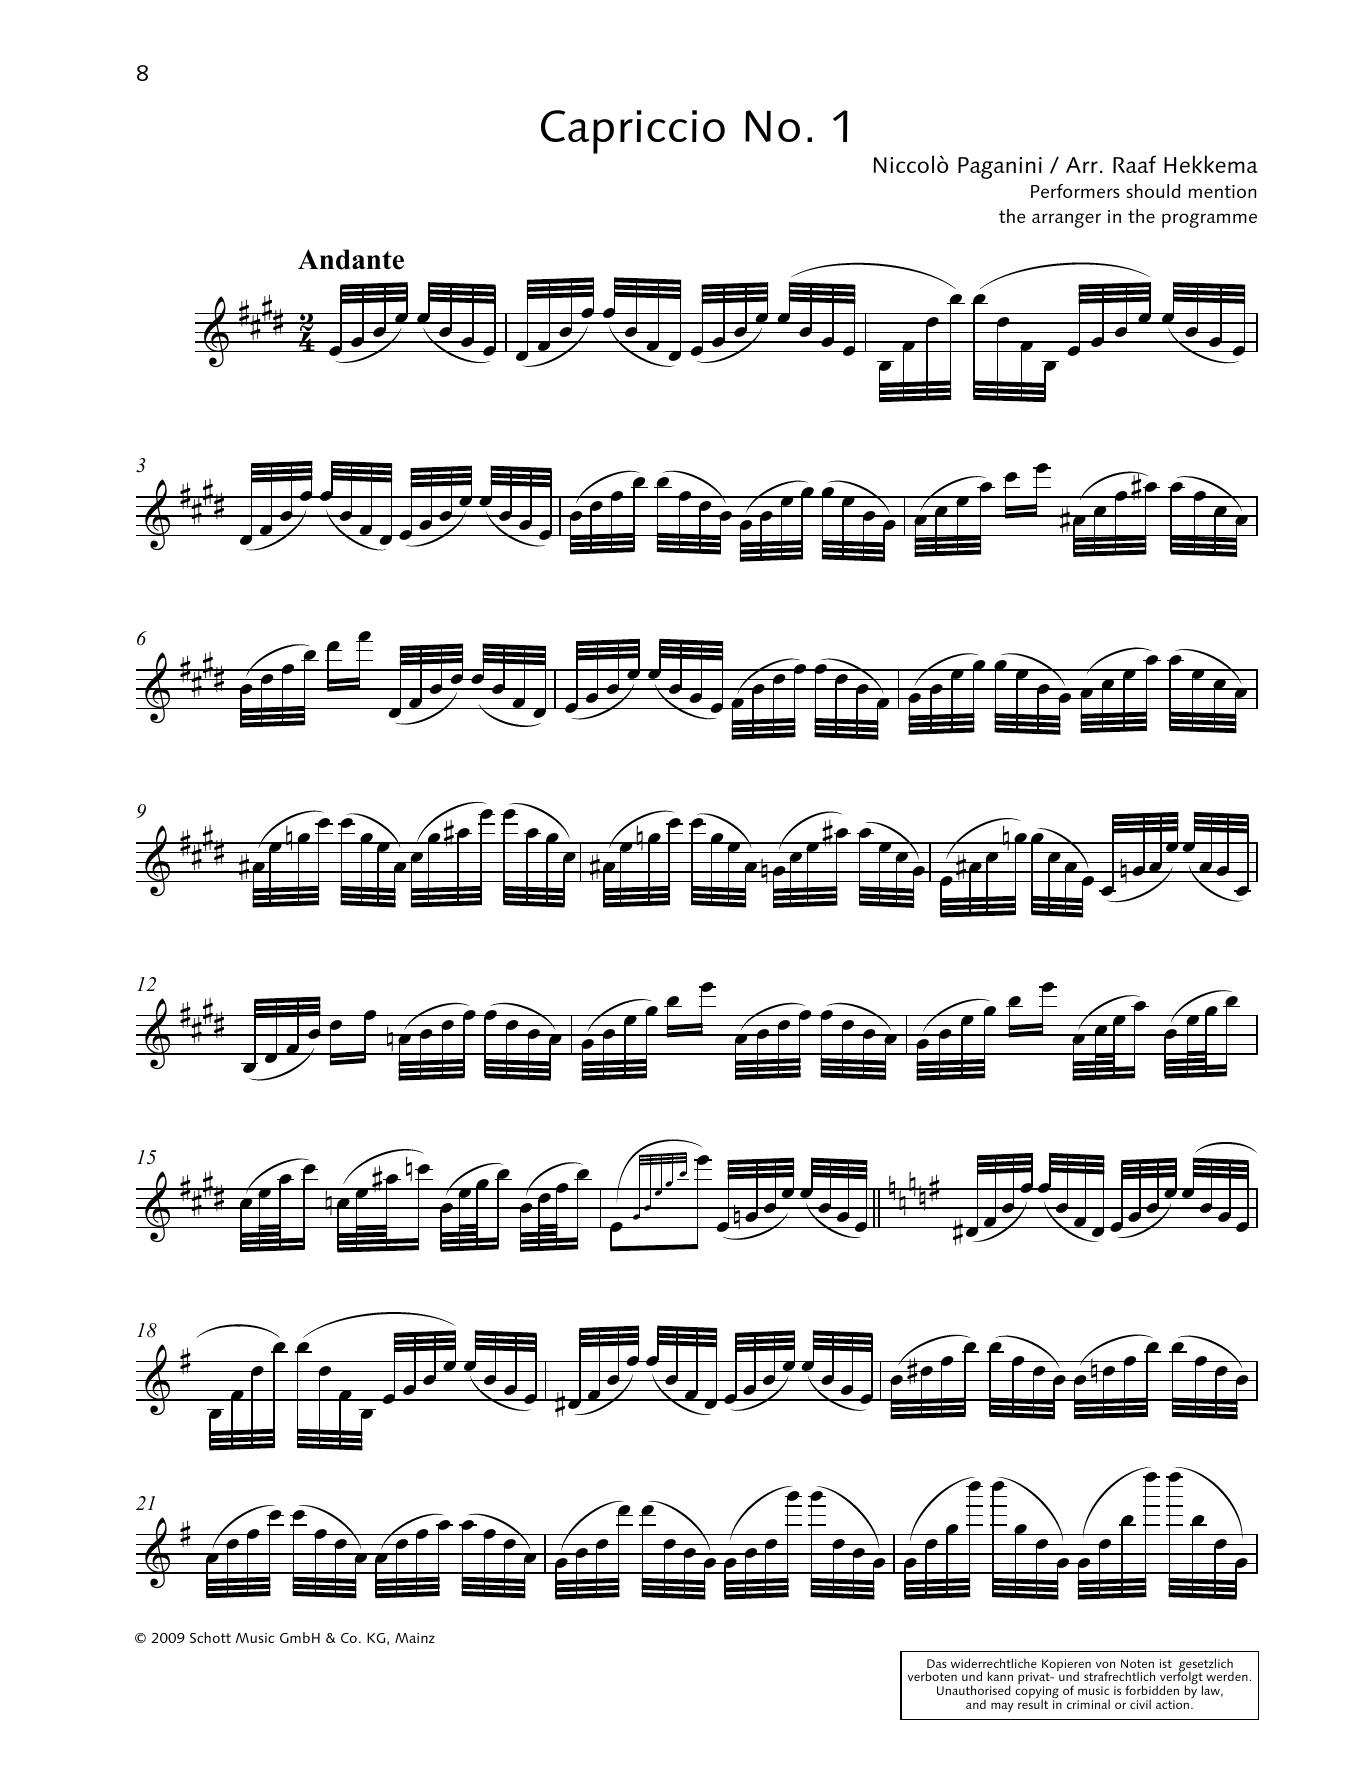 Capriccio No. 1 Sheet Music